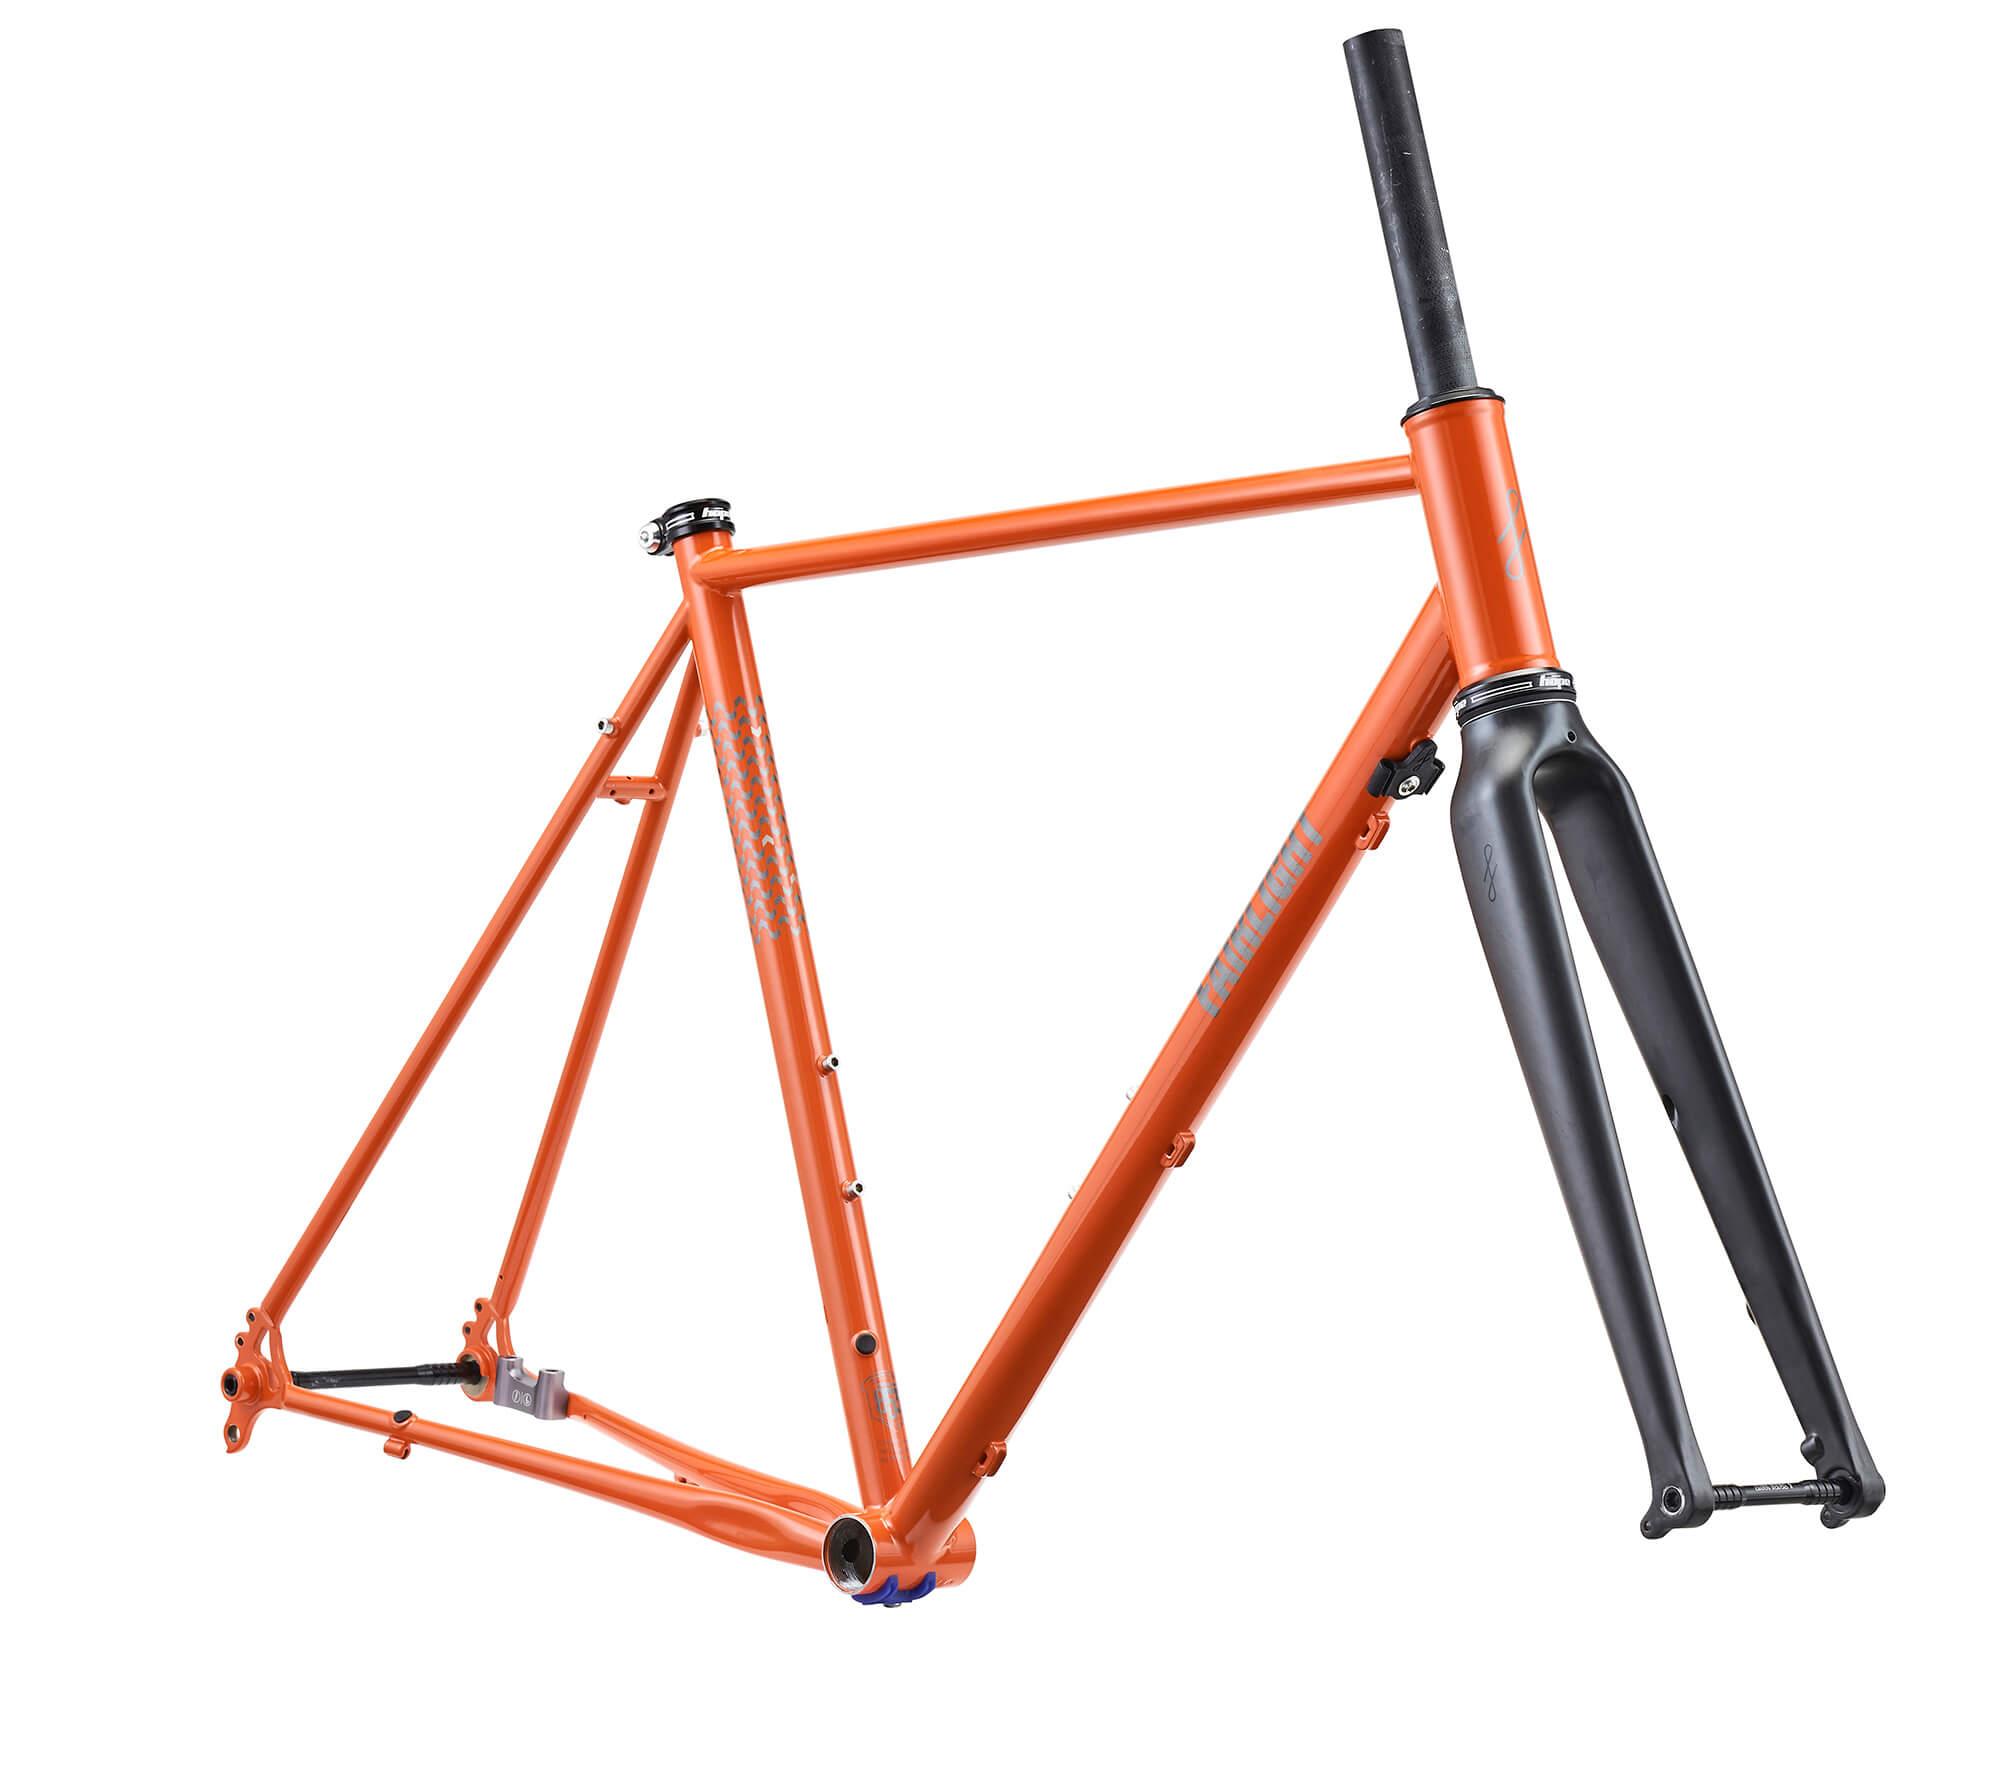 fairlightcycles.com